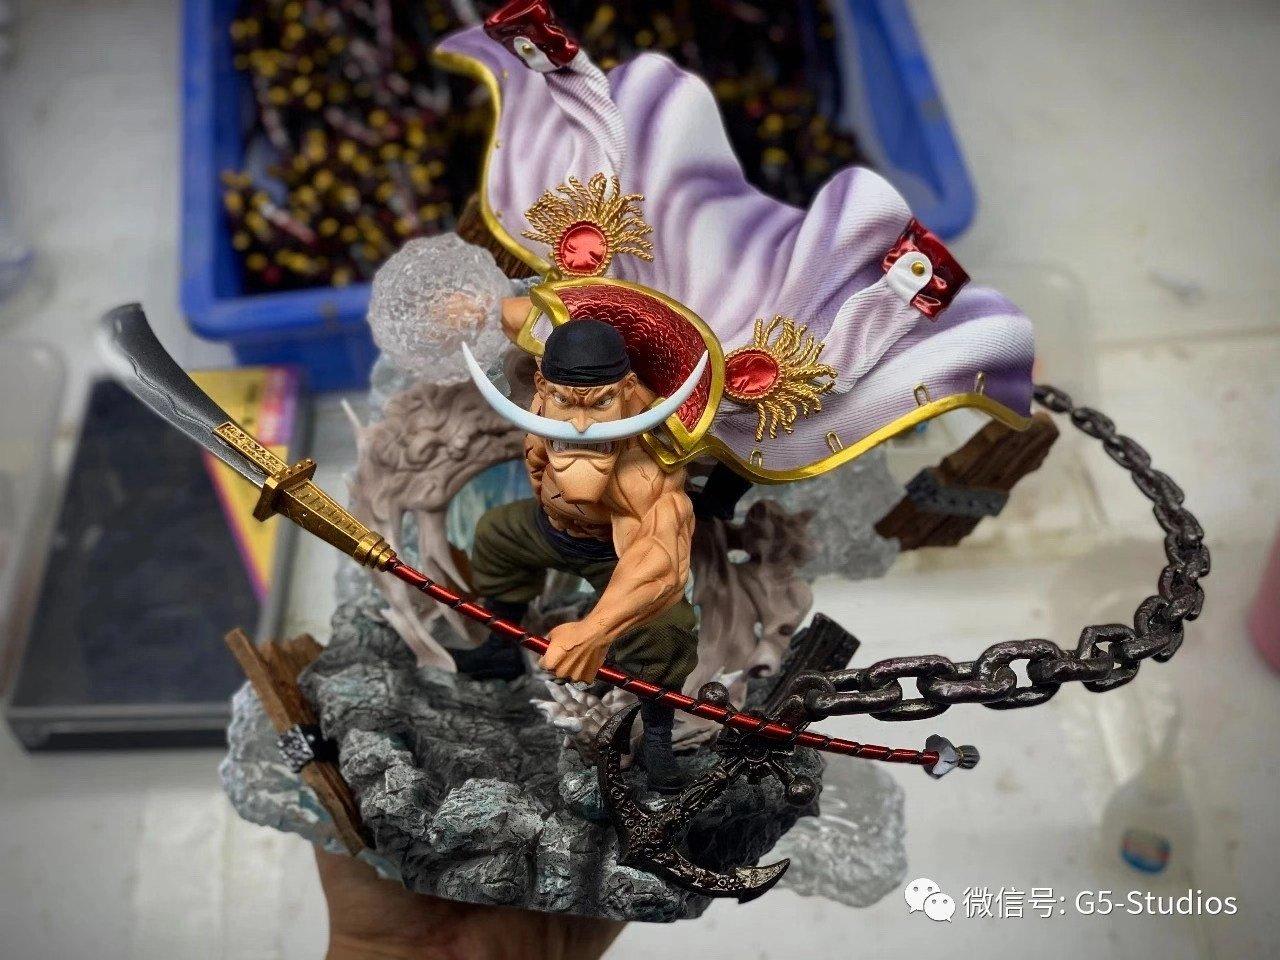 Image of [Last-Stock]One Piece G5 Studio Whitebeard Resin Statue